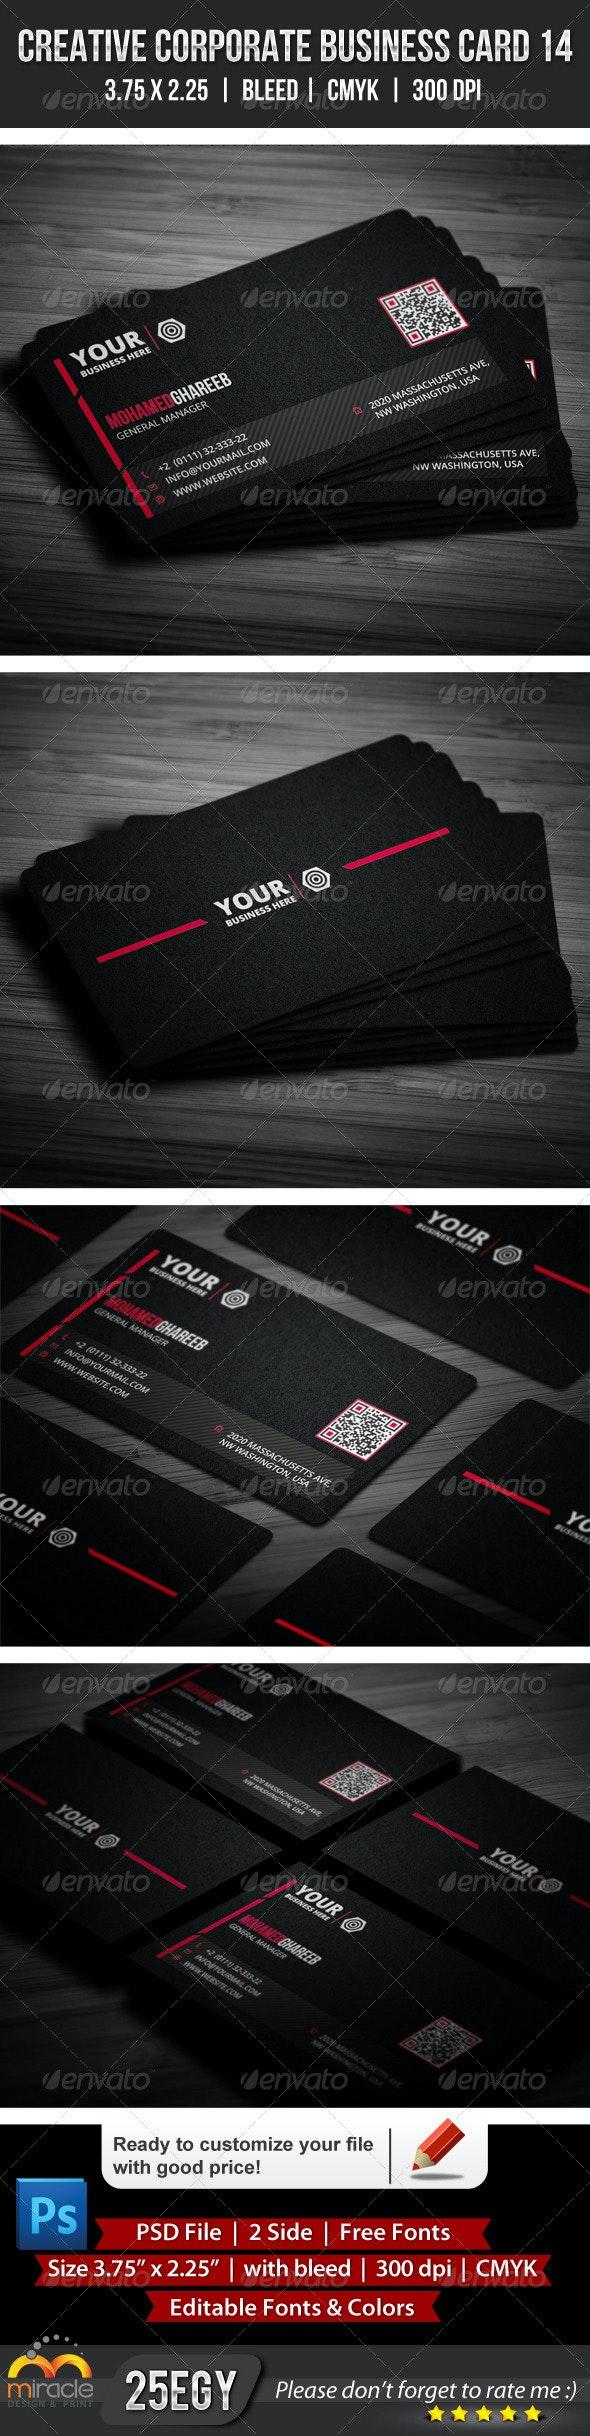 Creative Corporate Business Card 14 - Corporate Business Cards